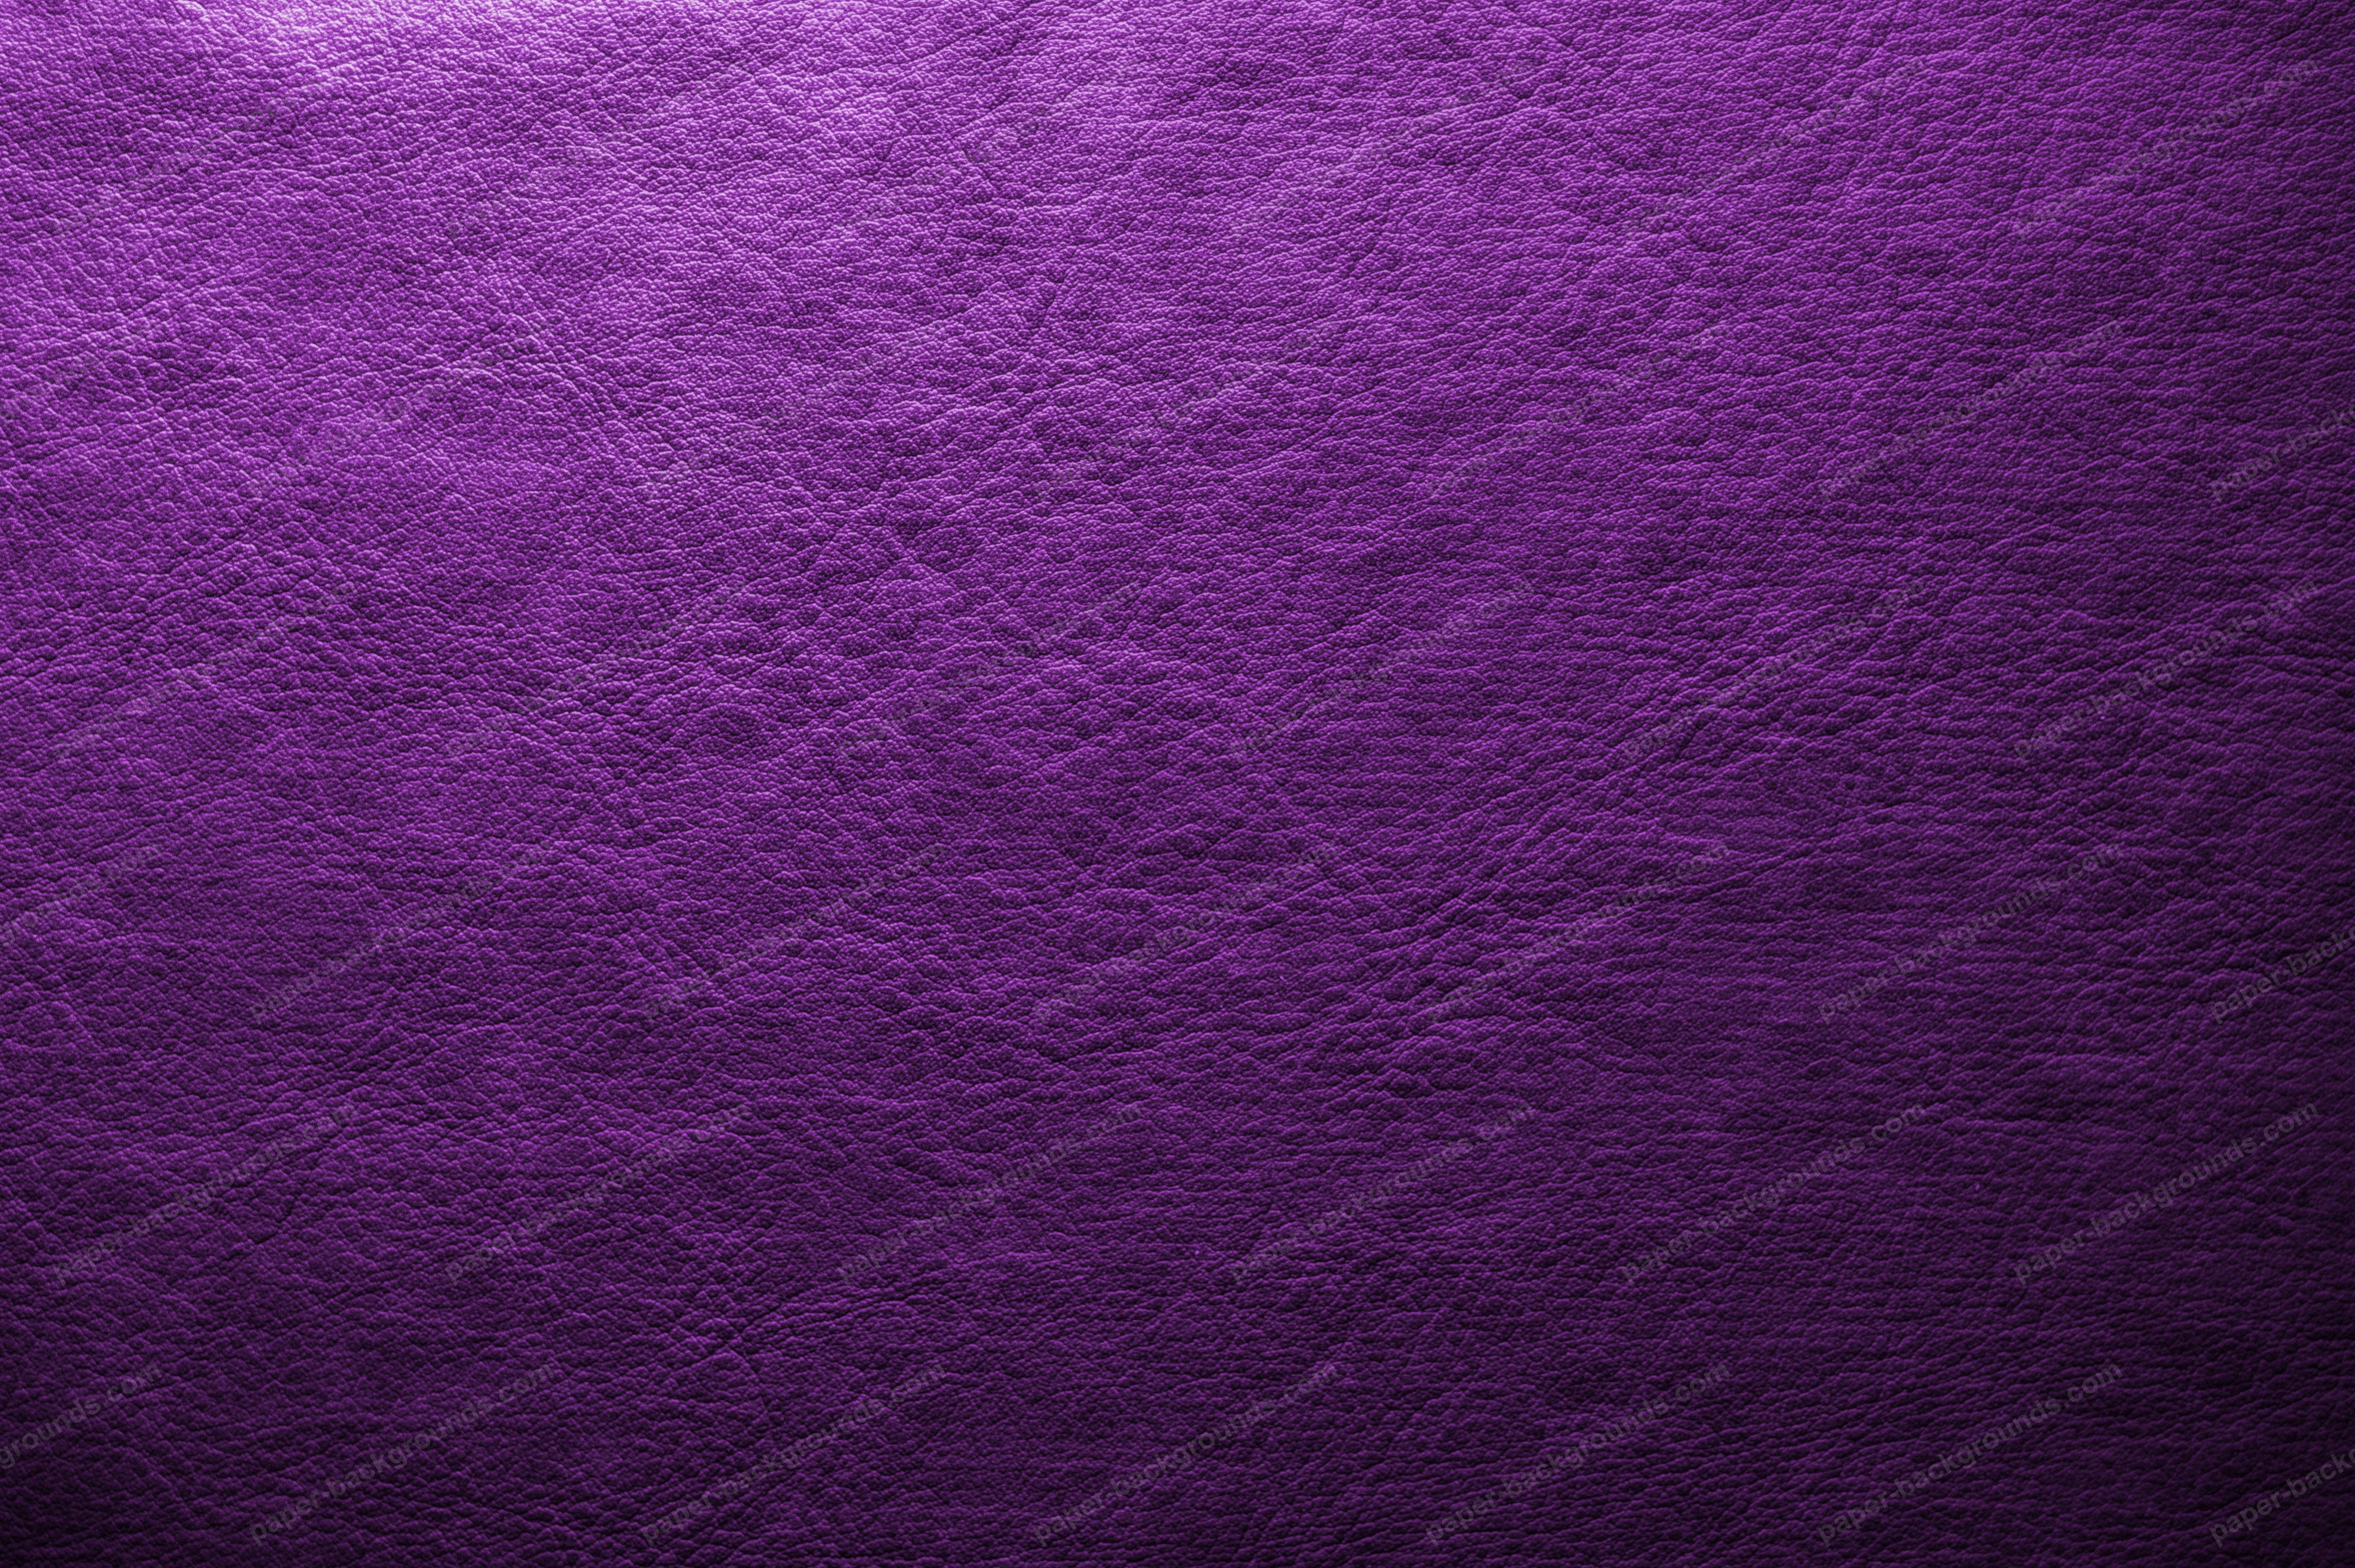 Abstract Purple Background - WallpaperSafari